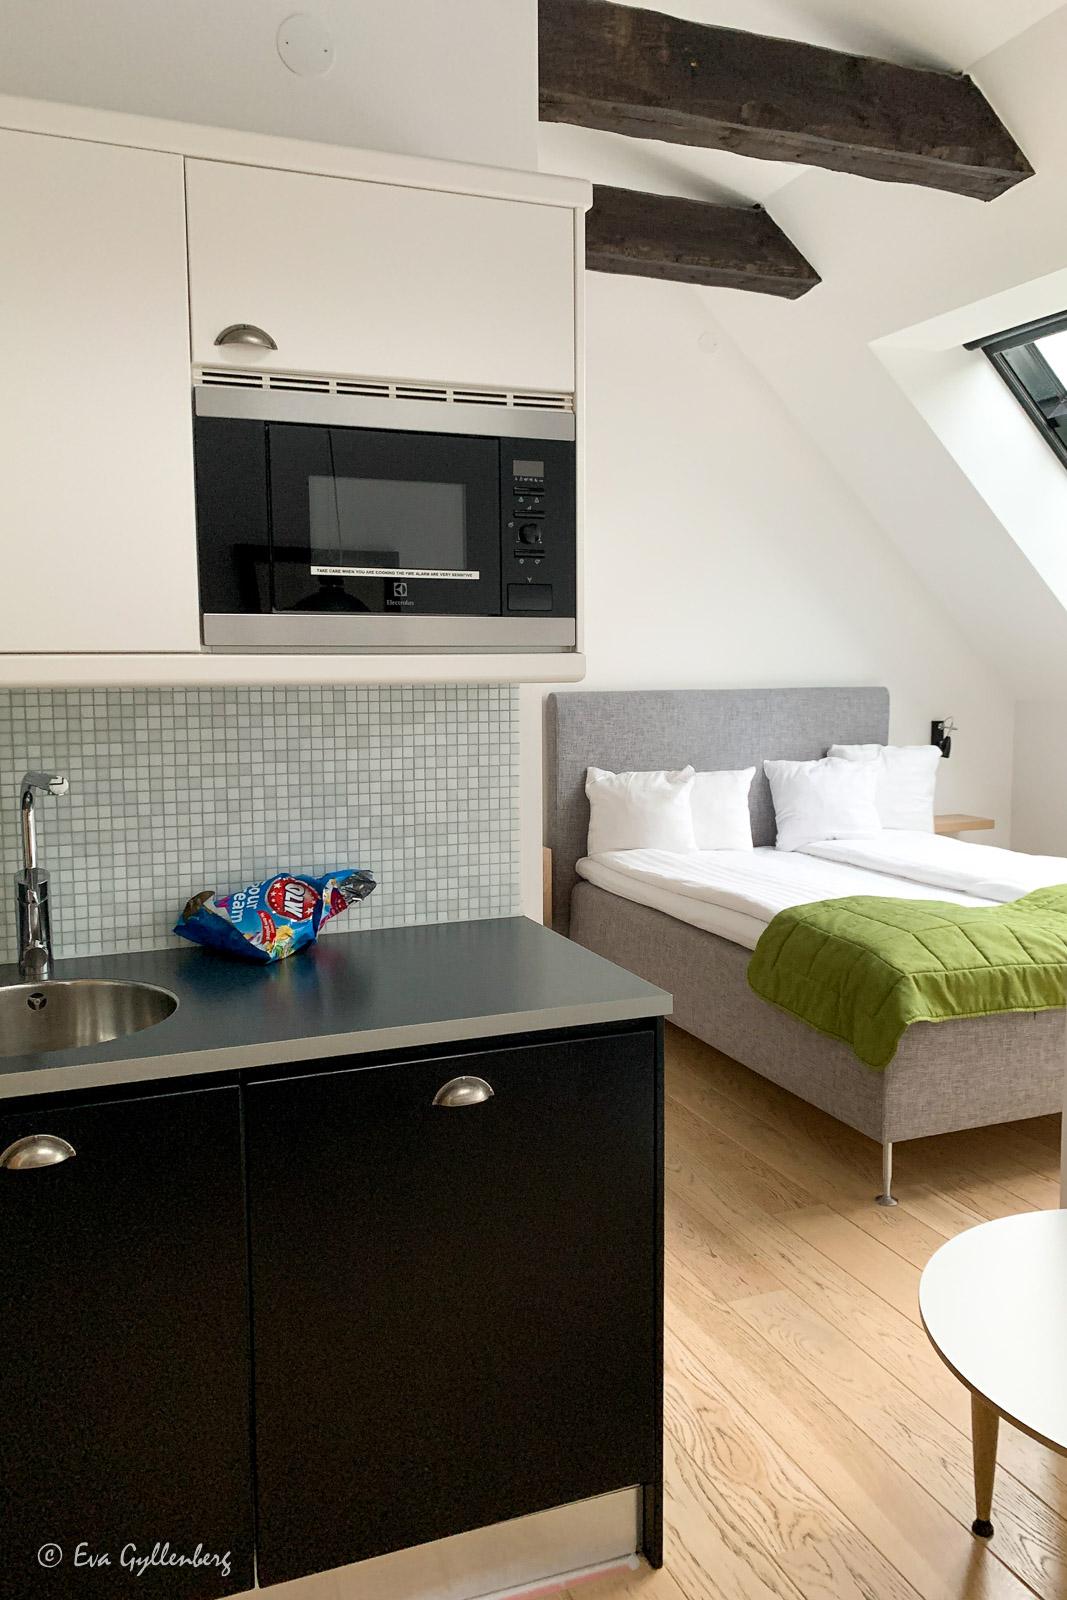 The More Hotel - Snyggt lägenhetshotell i Lund 16